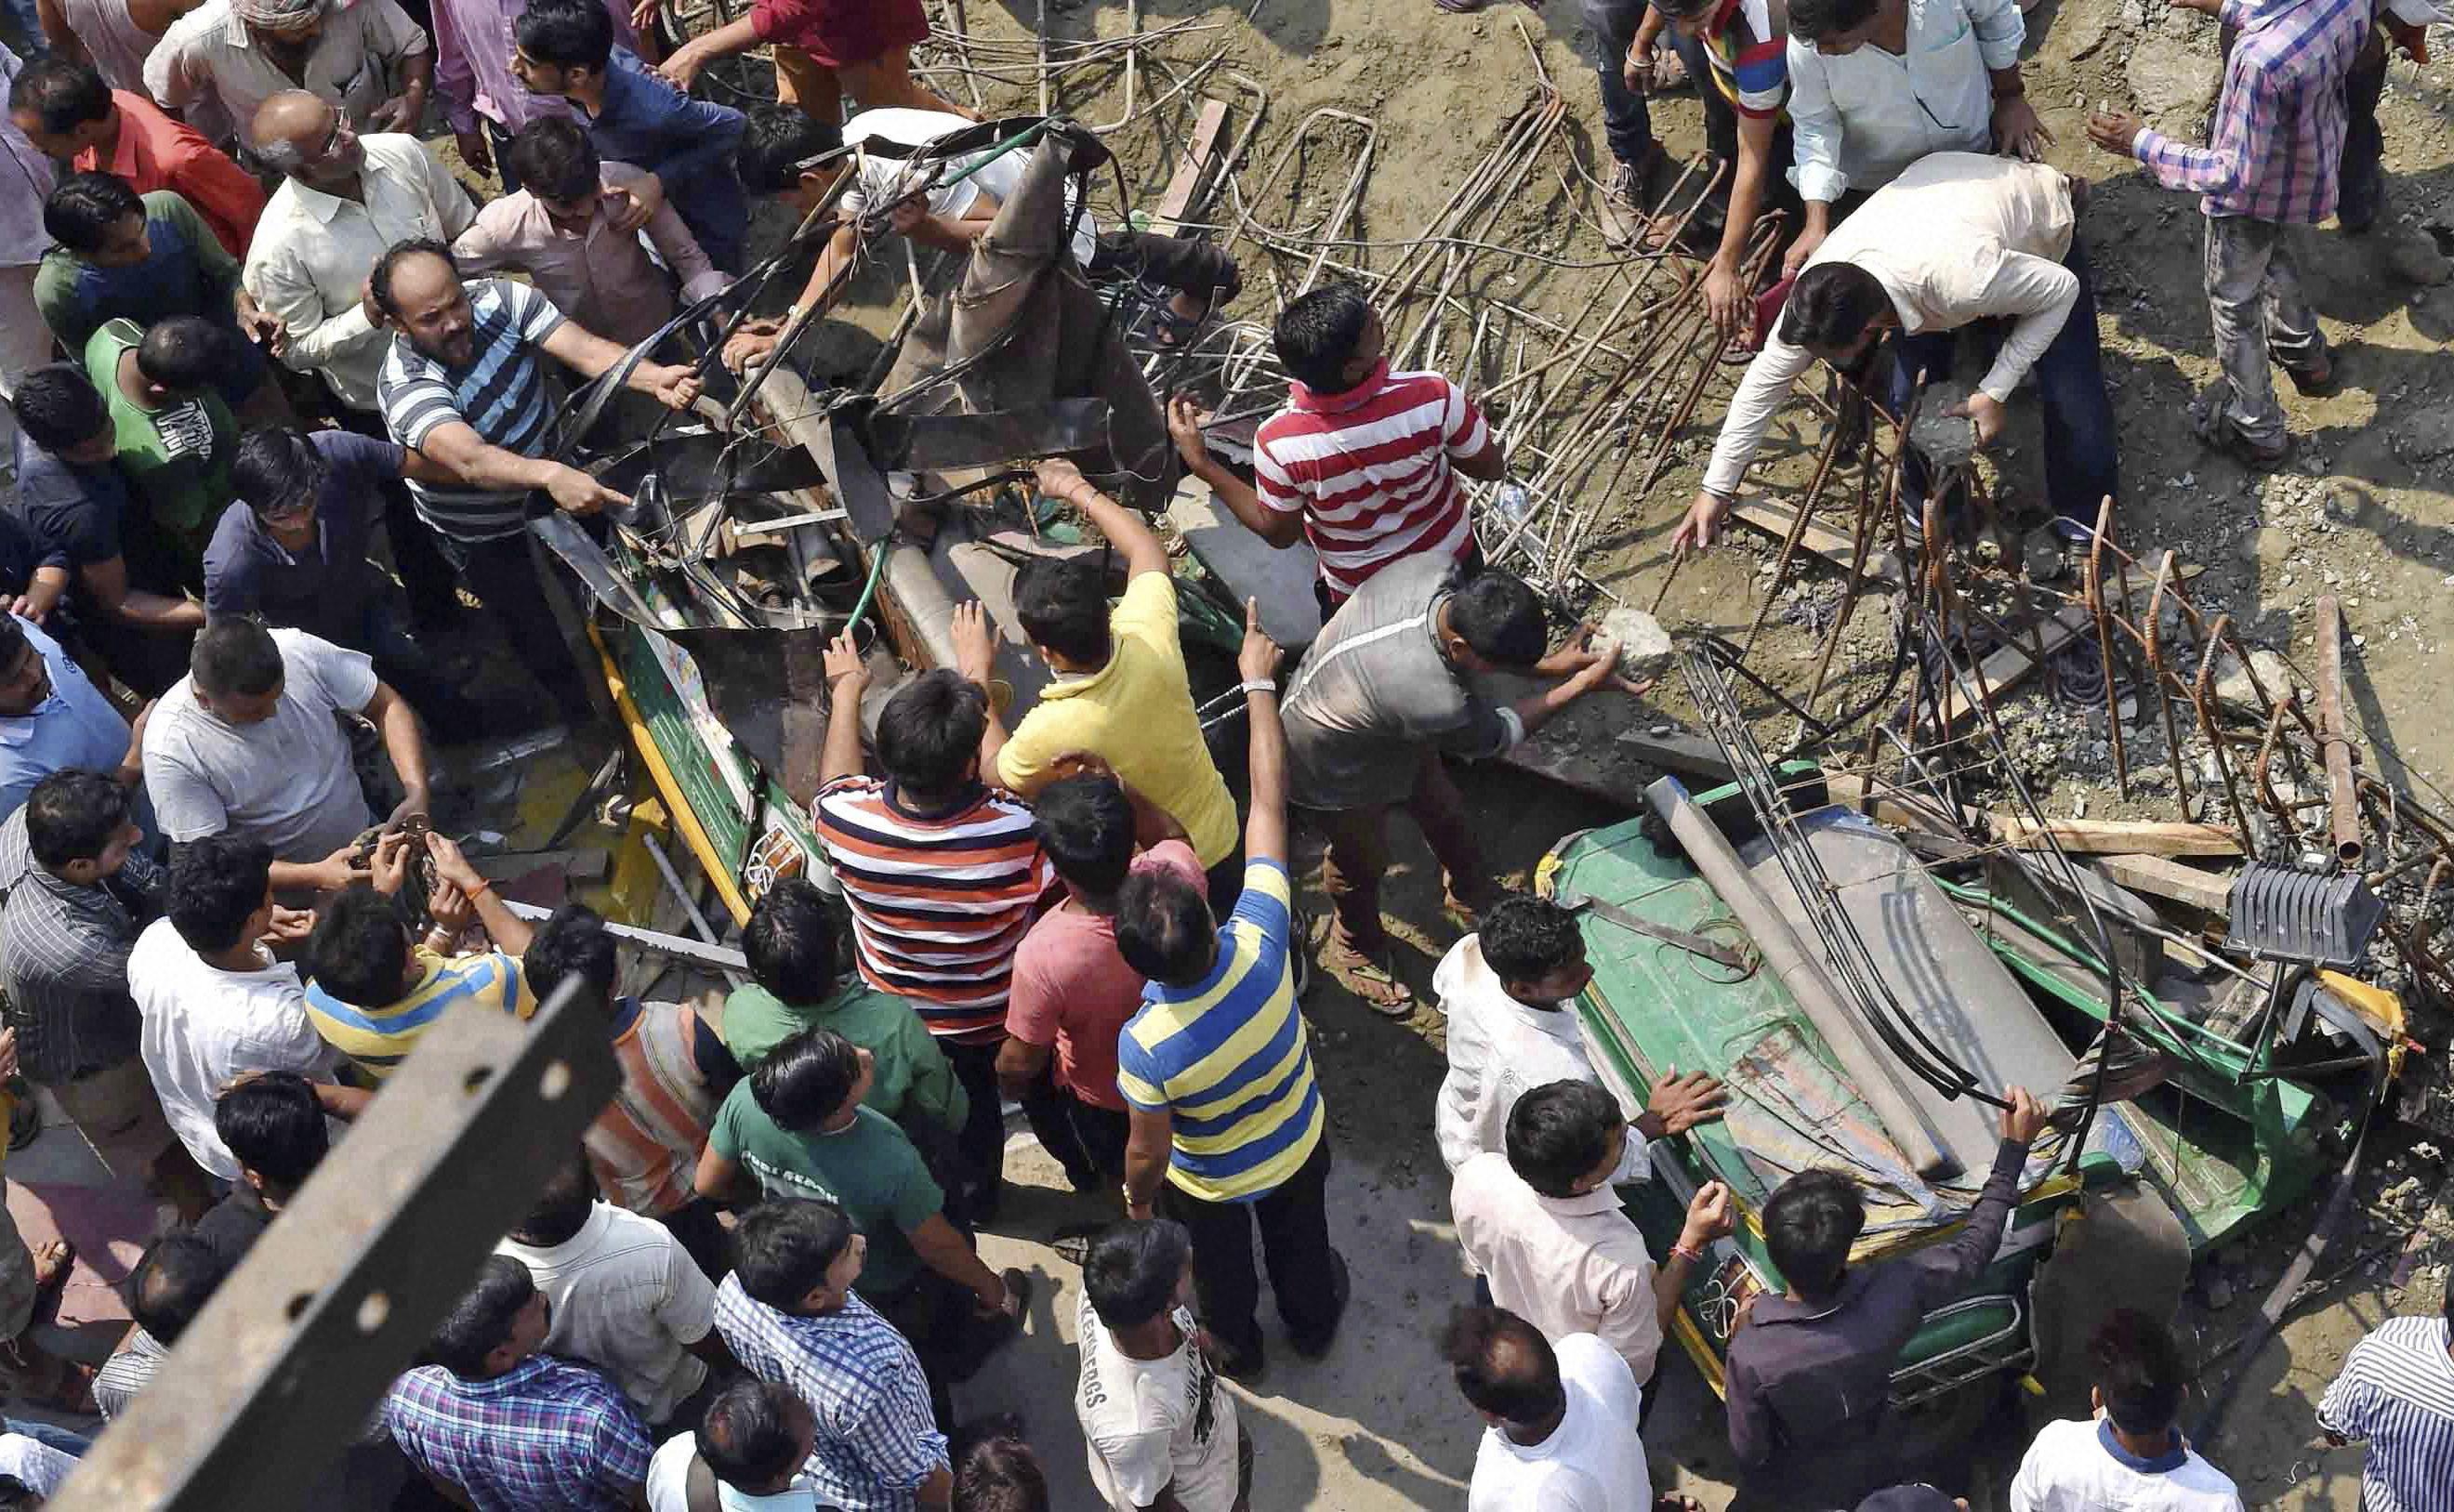 Watch: Moment Kolkata Overpass Collapses, 15 Killed so Far